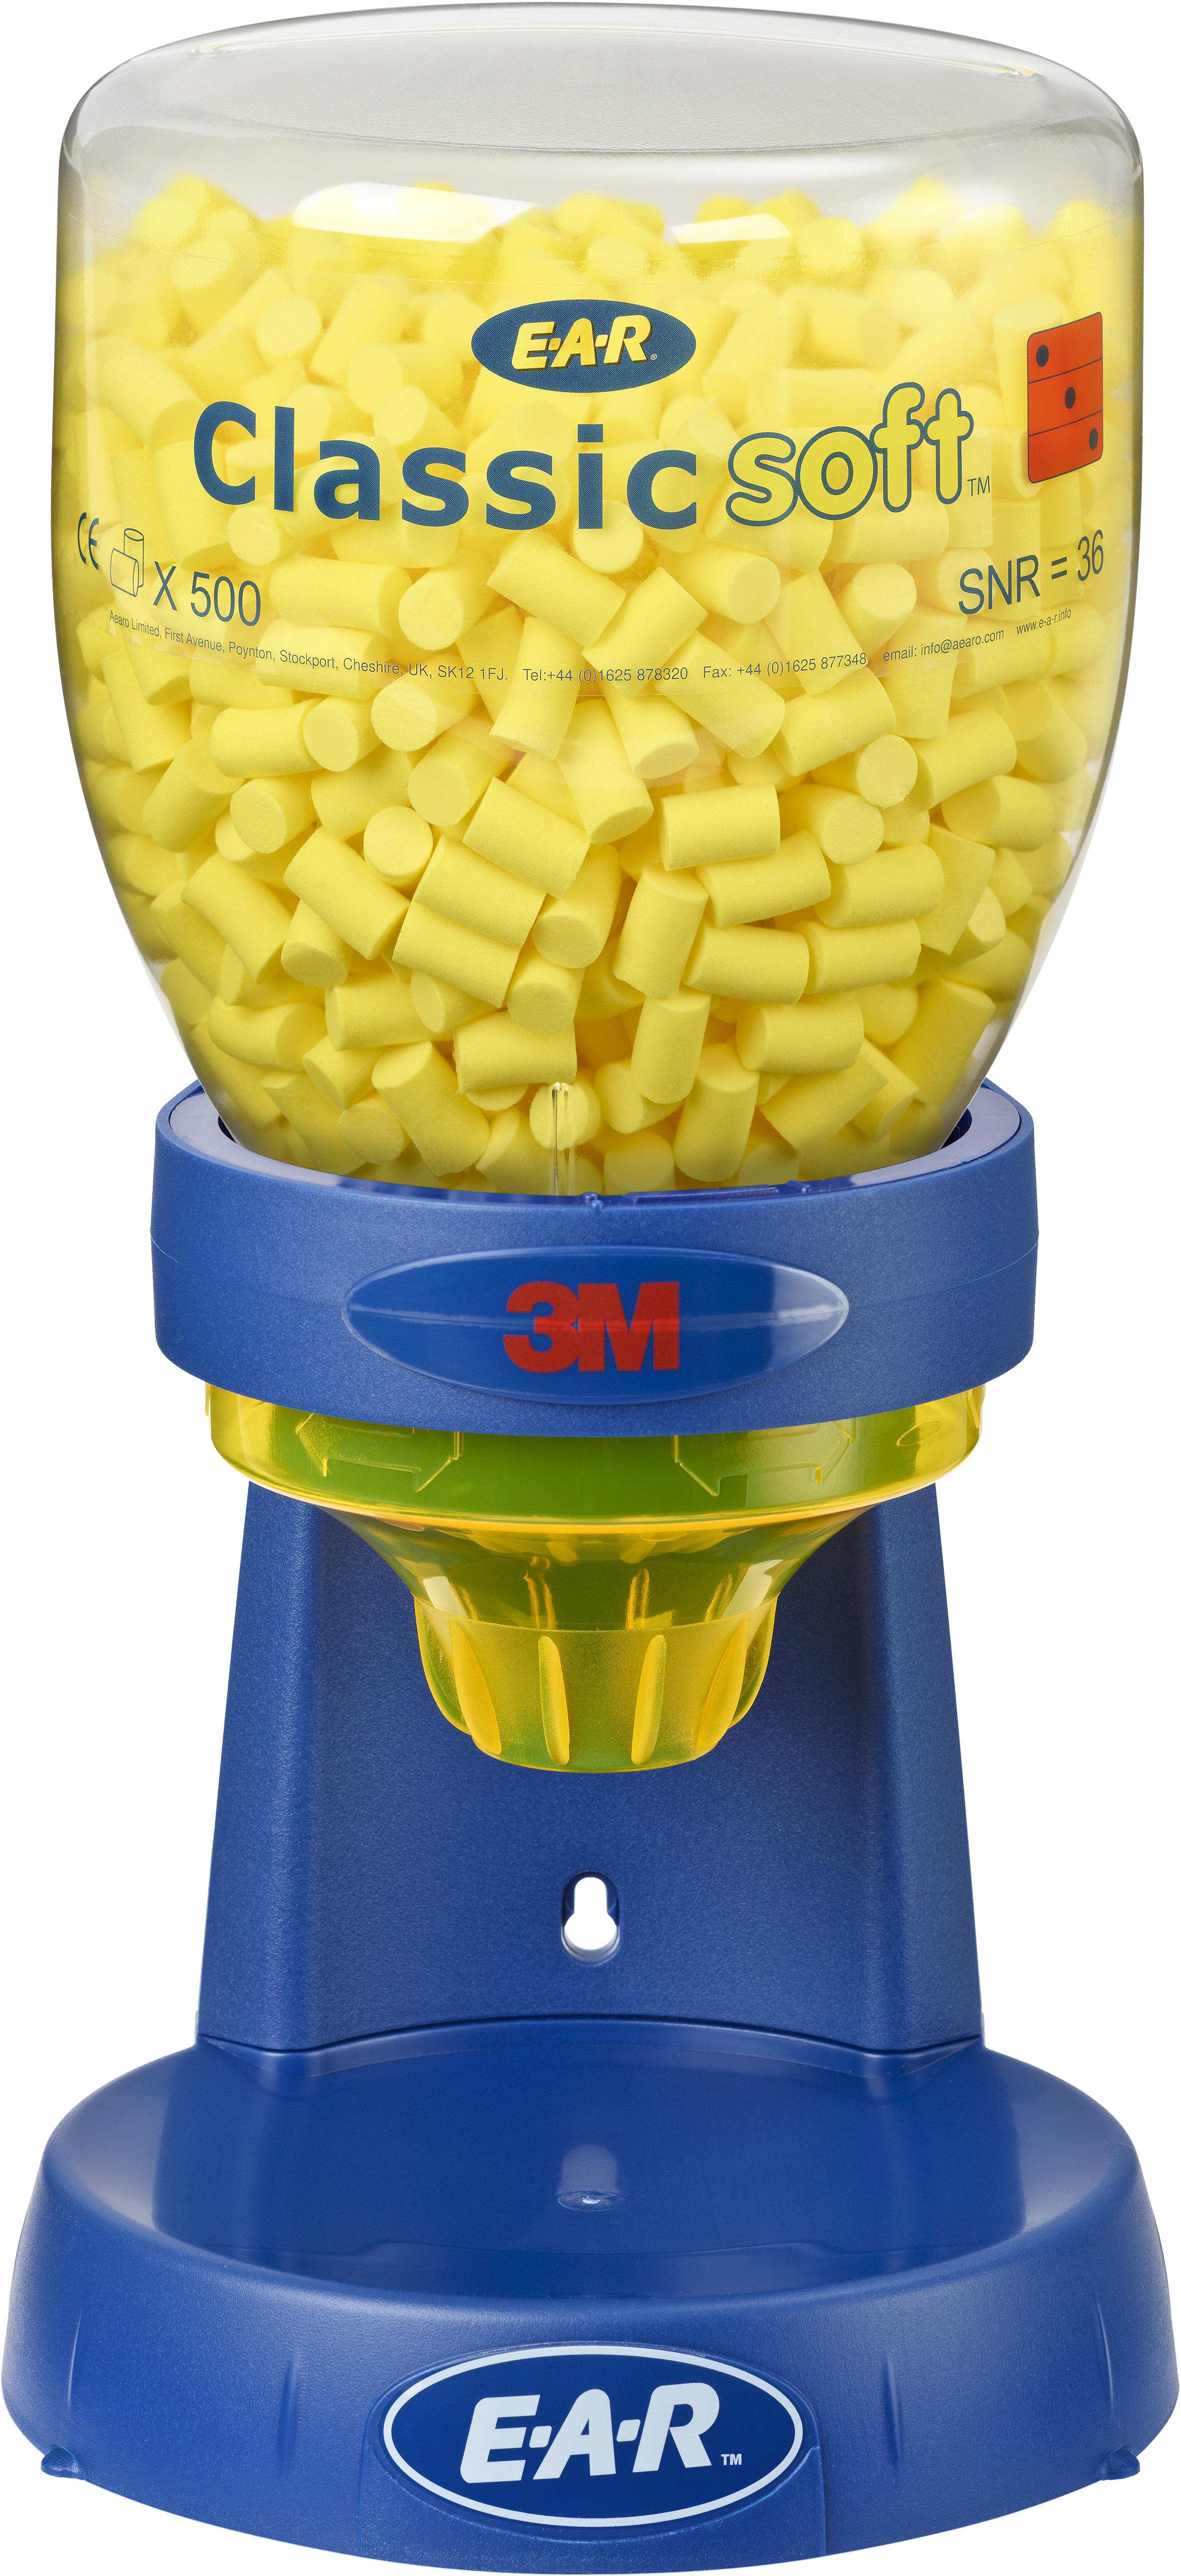 3M E-A-R CLASSIC Soft Refill Aufsatz PD01800